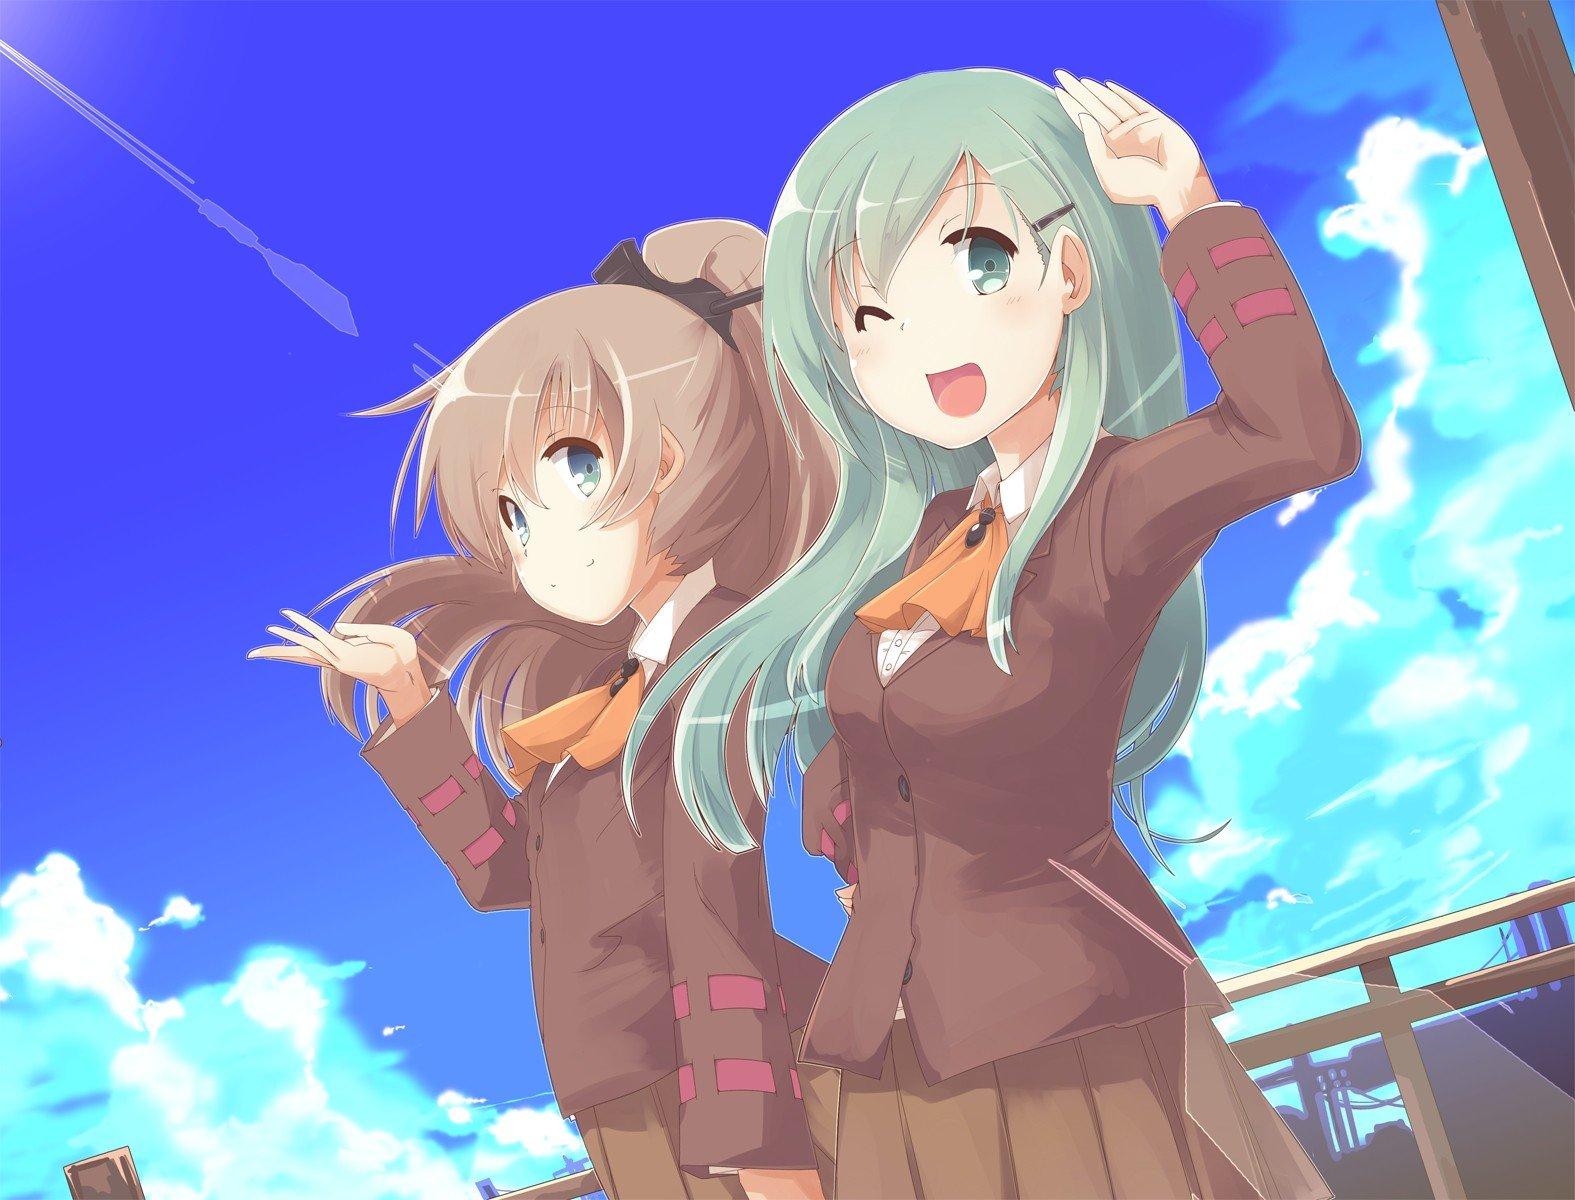 anime, Anime girls, Kantai Collection, School uniform, Kumano (KanColle), Suzuya (KanColle) Wallpaper